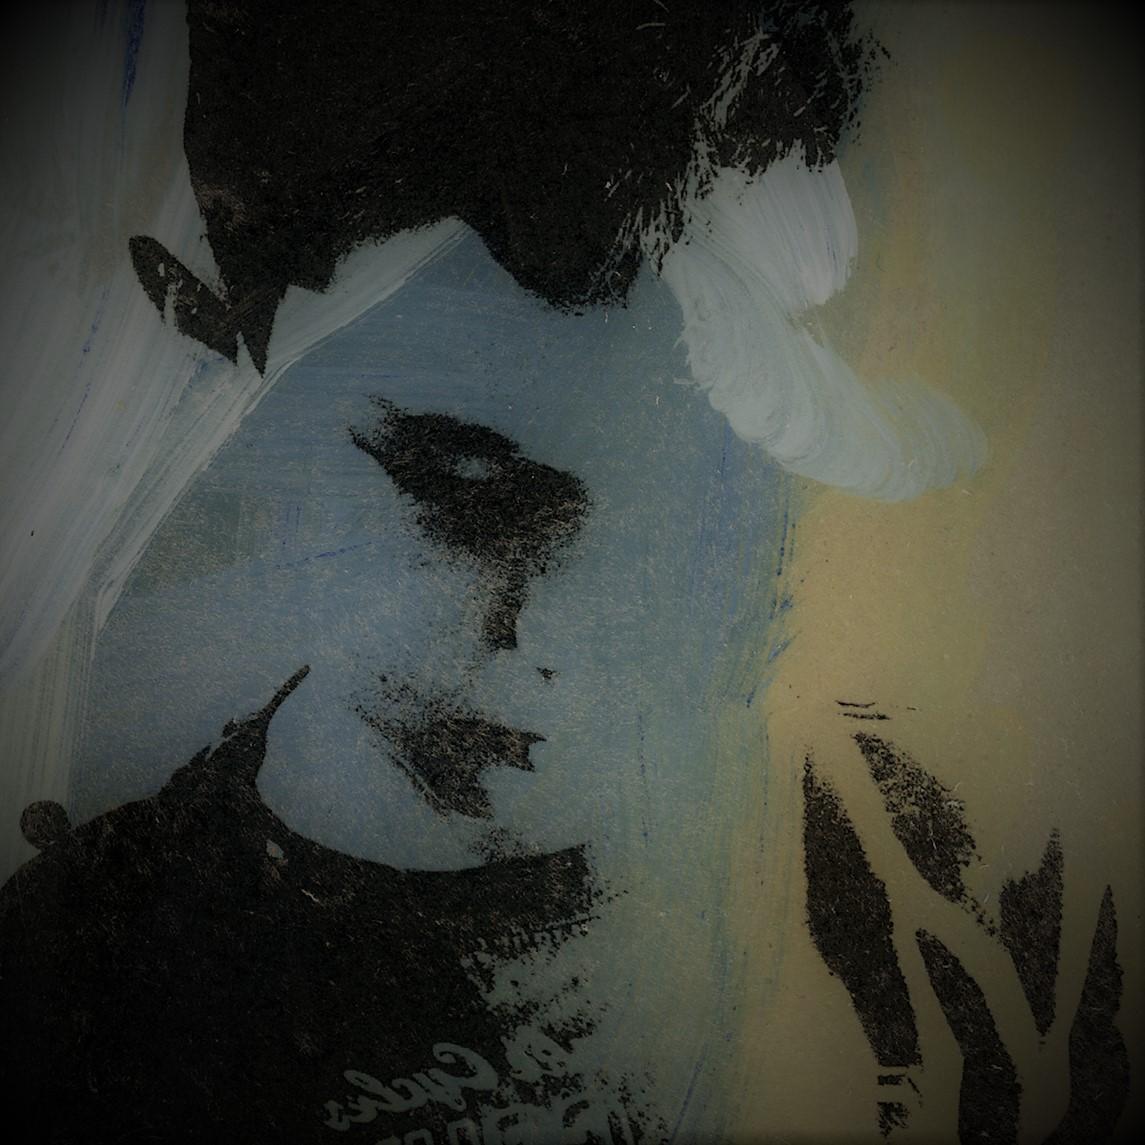 Ugly Frank_painting_promo_beatport spec.jpg